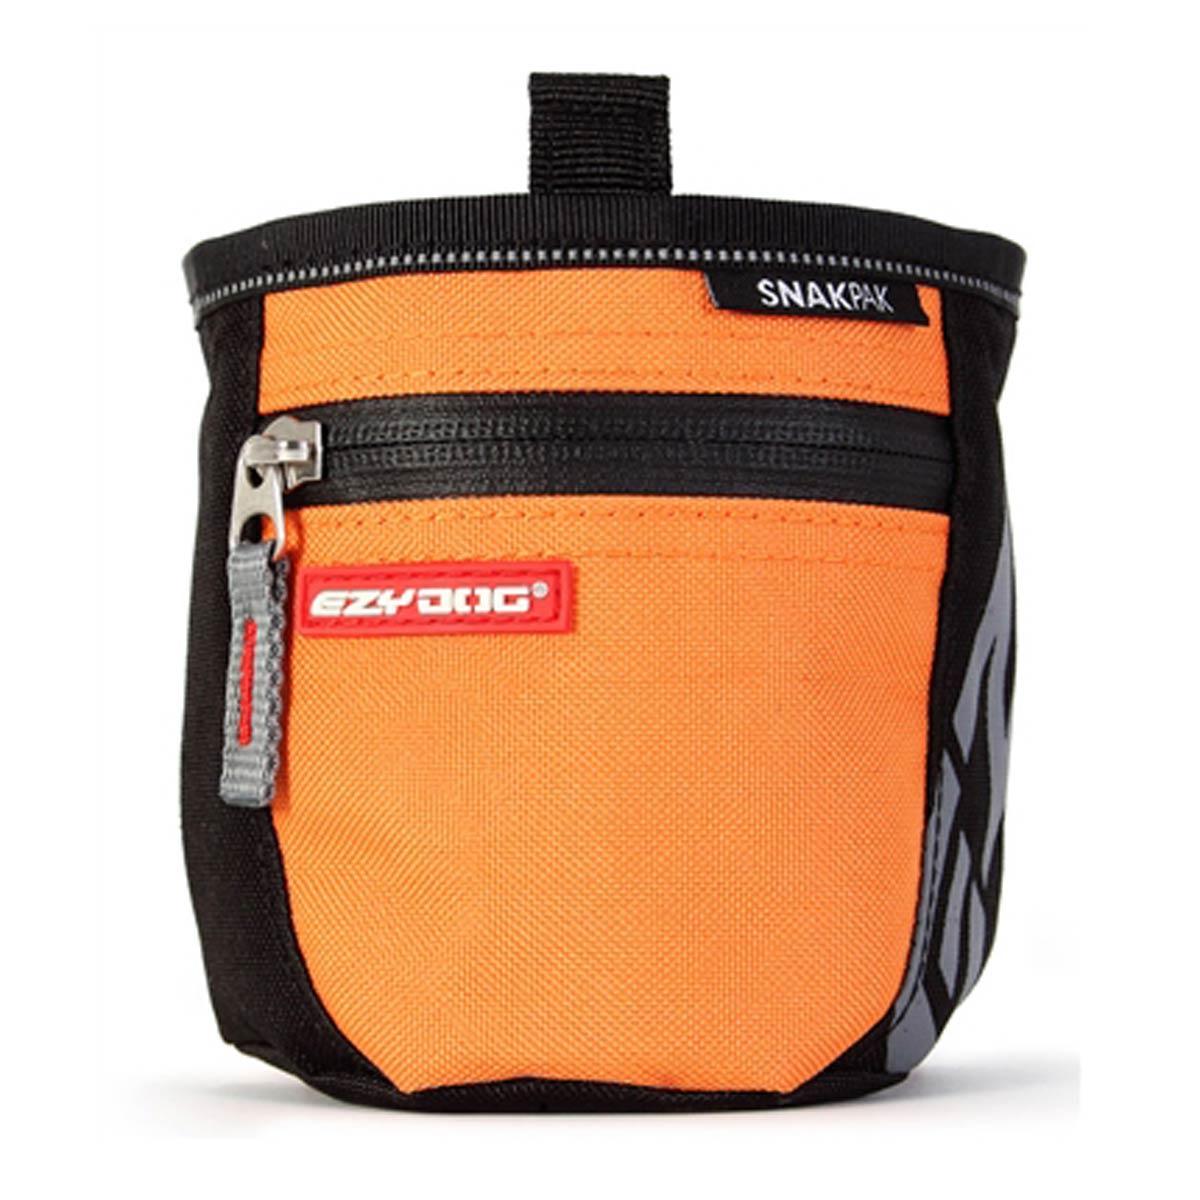 Ezydog Snakpak Dog Treat Bag Orange